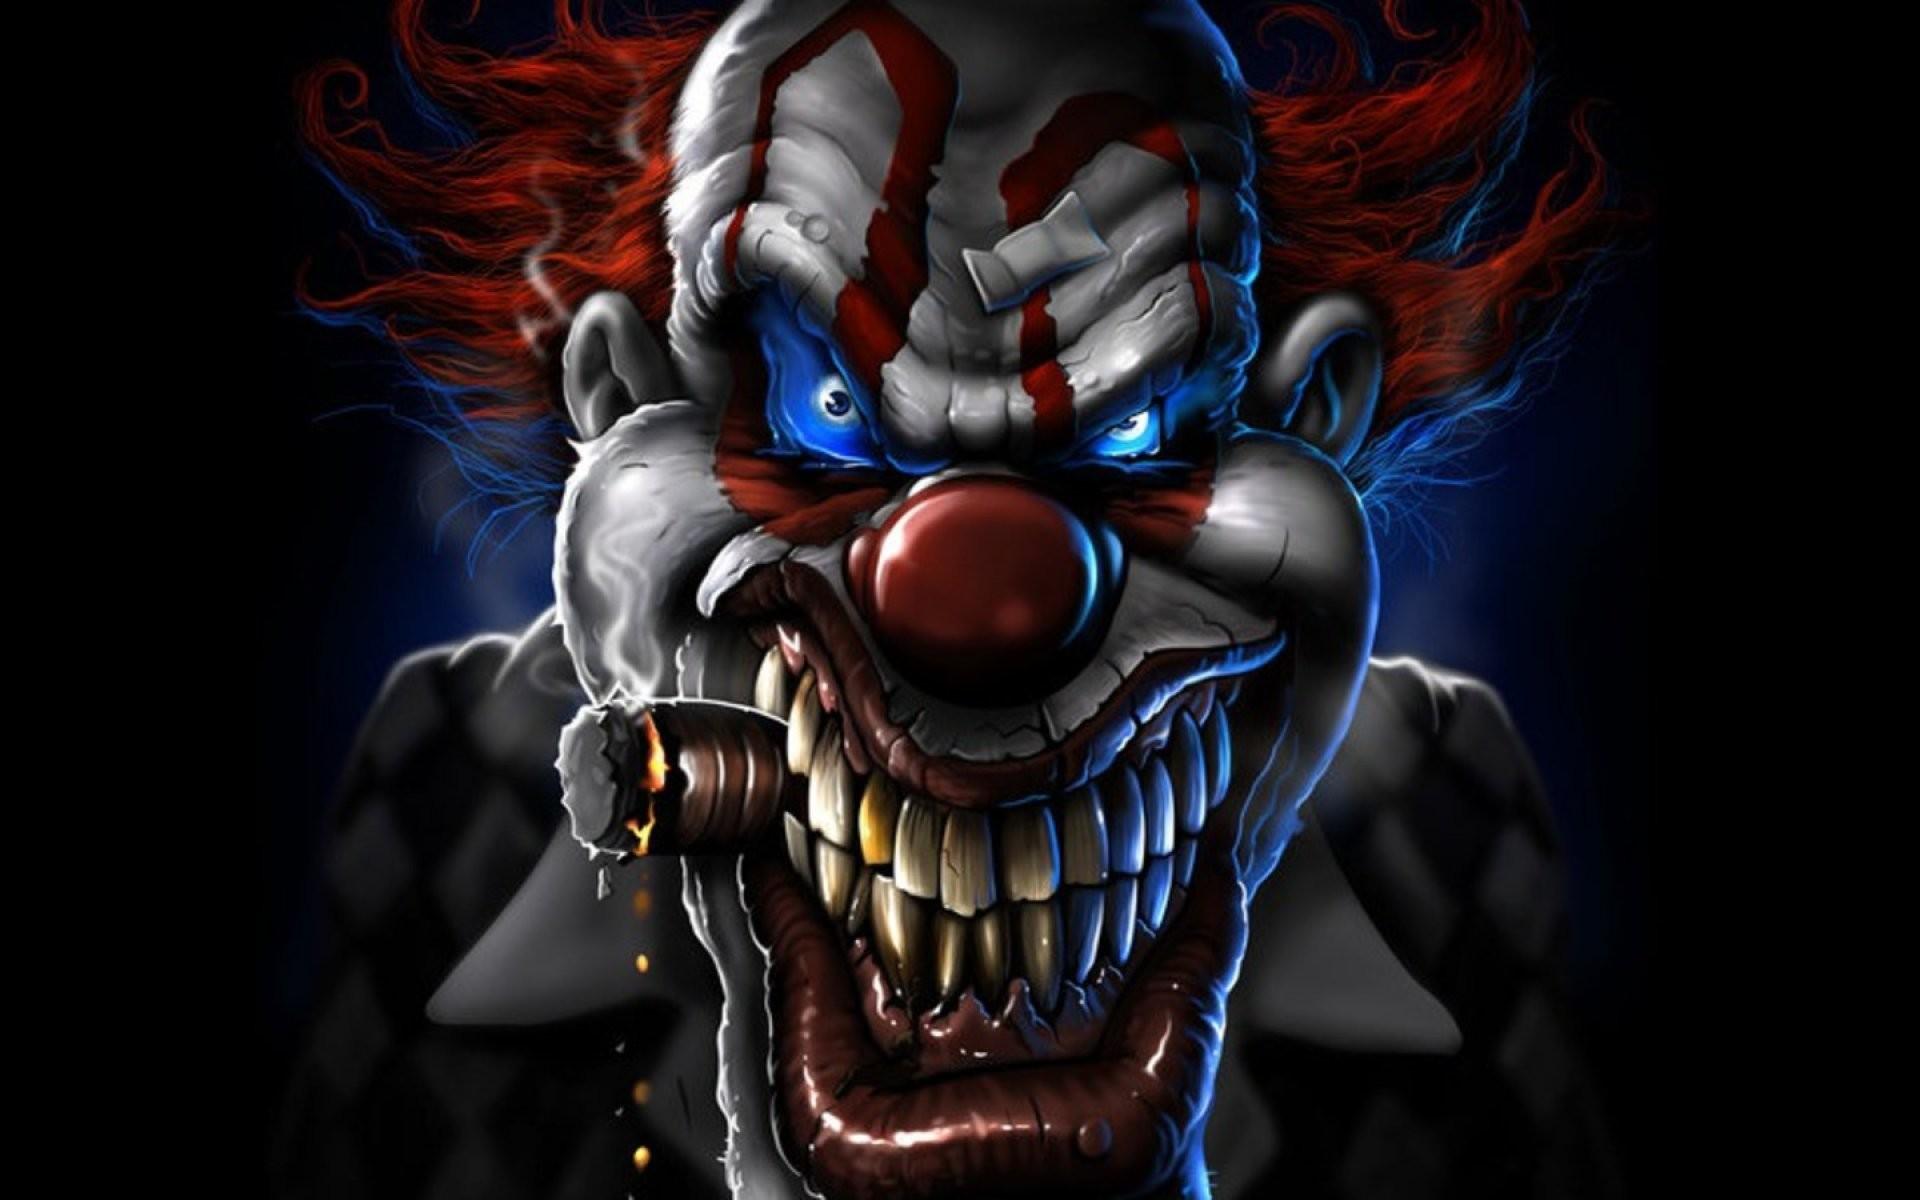 Res: 1920x1200, Dark horror evil clown art artwork f wallpaper |  | 693572 |  WallpaperUP